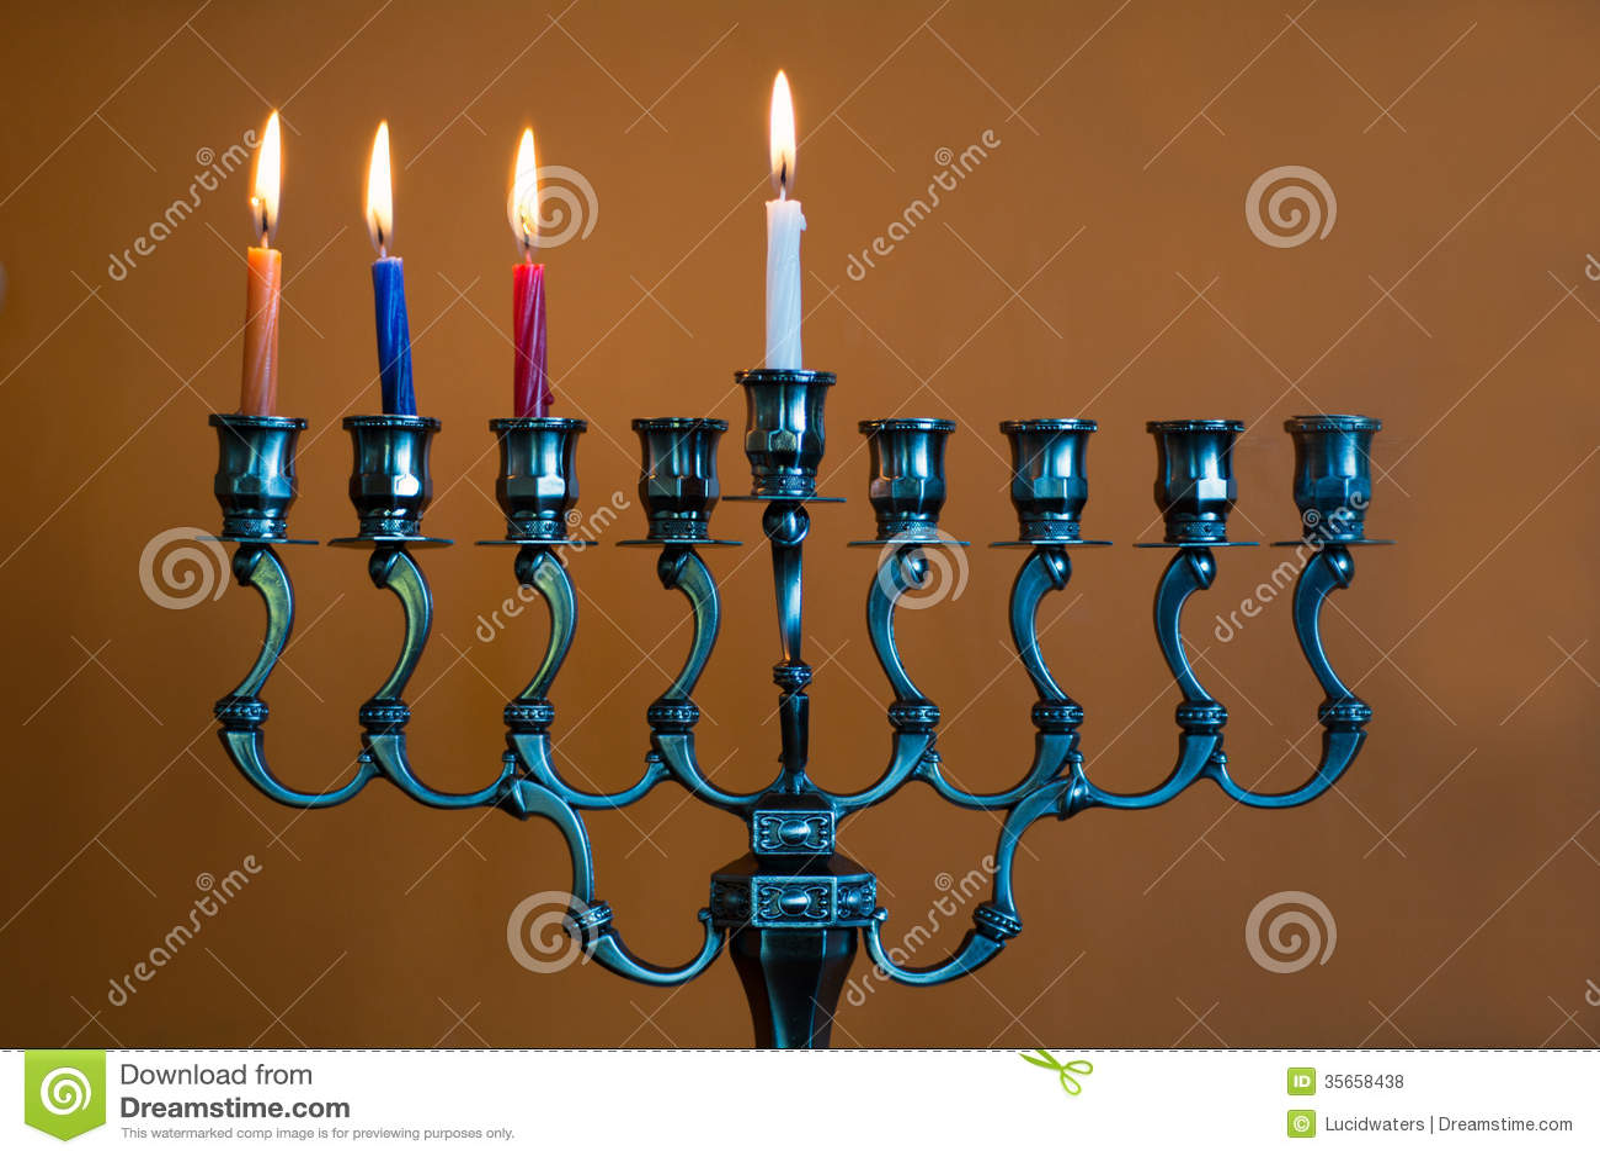 Hanukkah Menorah On The Third Day Of Hanukkah Stock Photo Image Of